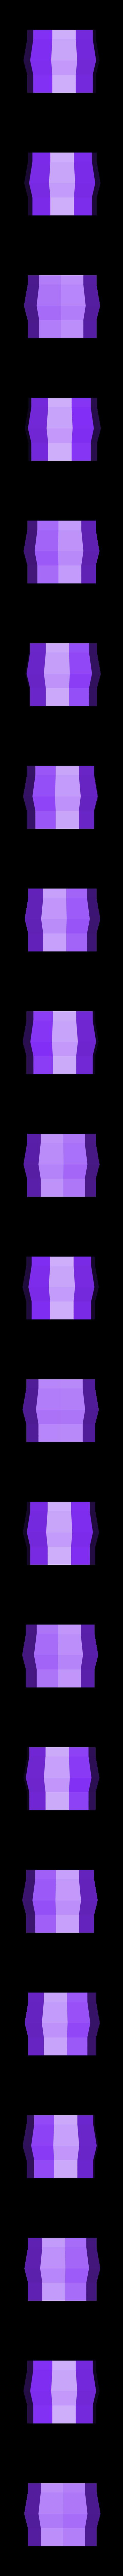 newest_vase.stl Download free STL file Geometric Vase • 3D printable object, 3DPrintingGurus